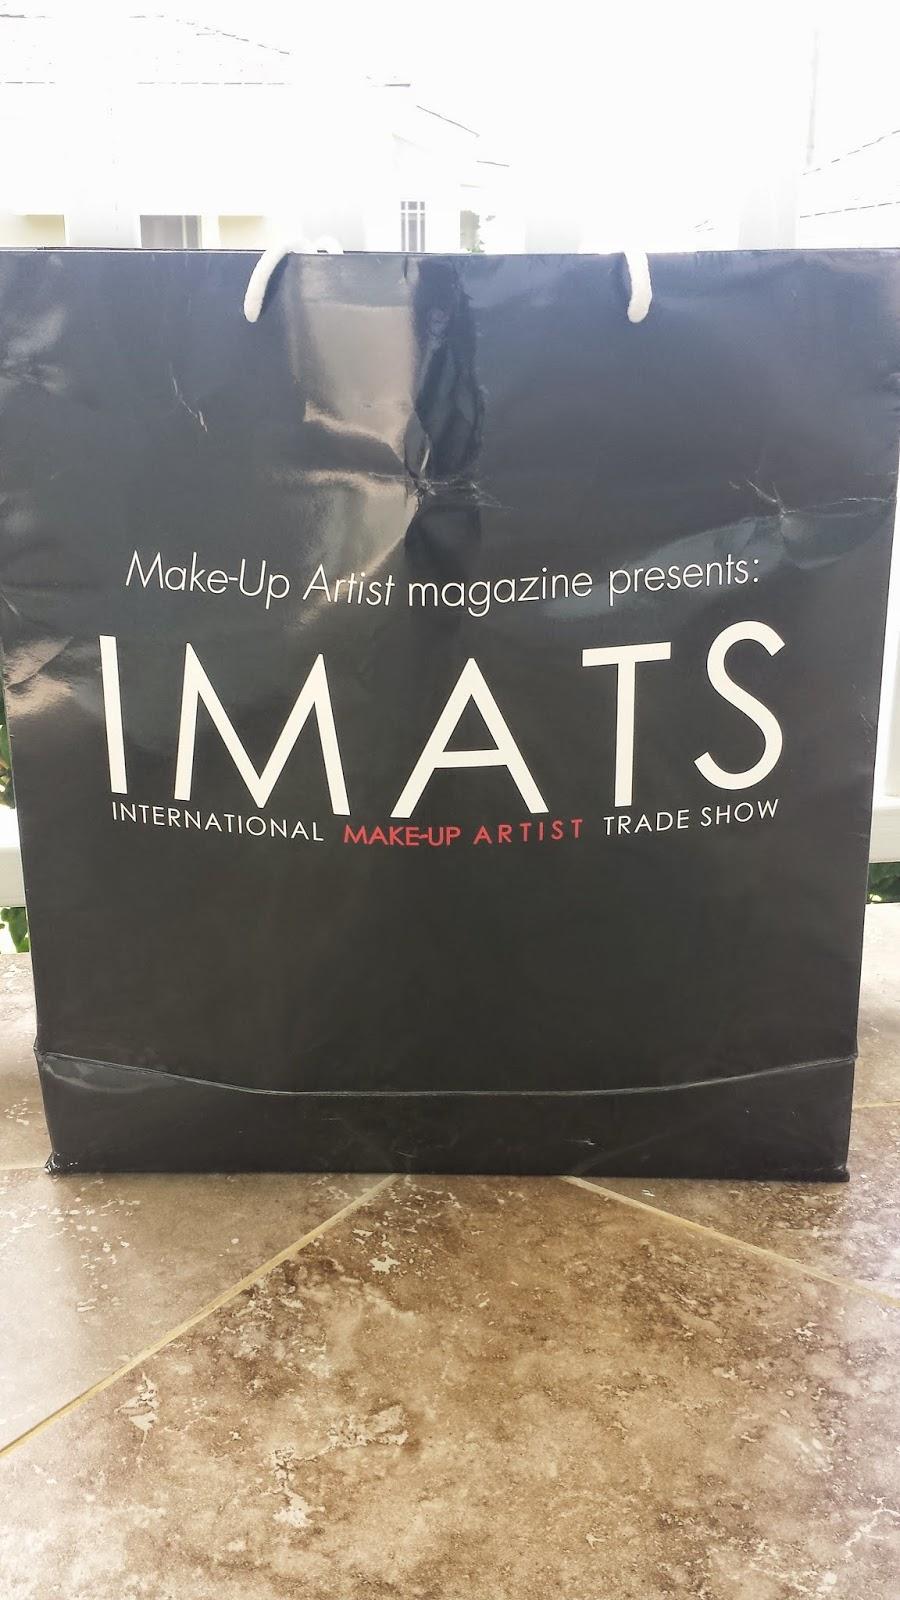 IMATS NYC 2015 bag - www.modenmakeup.com